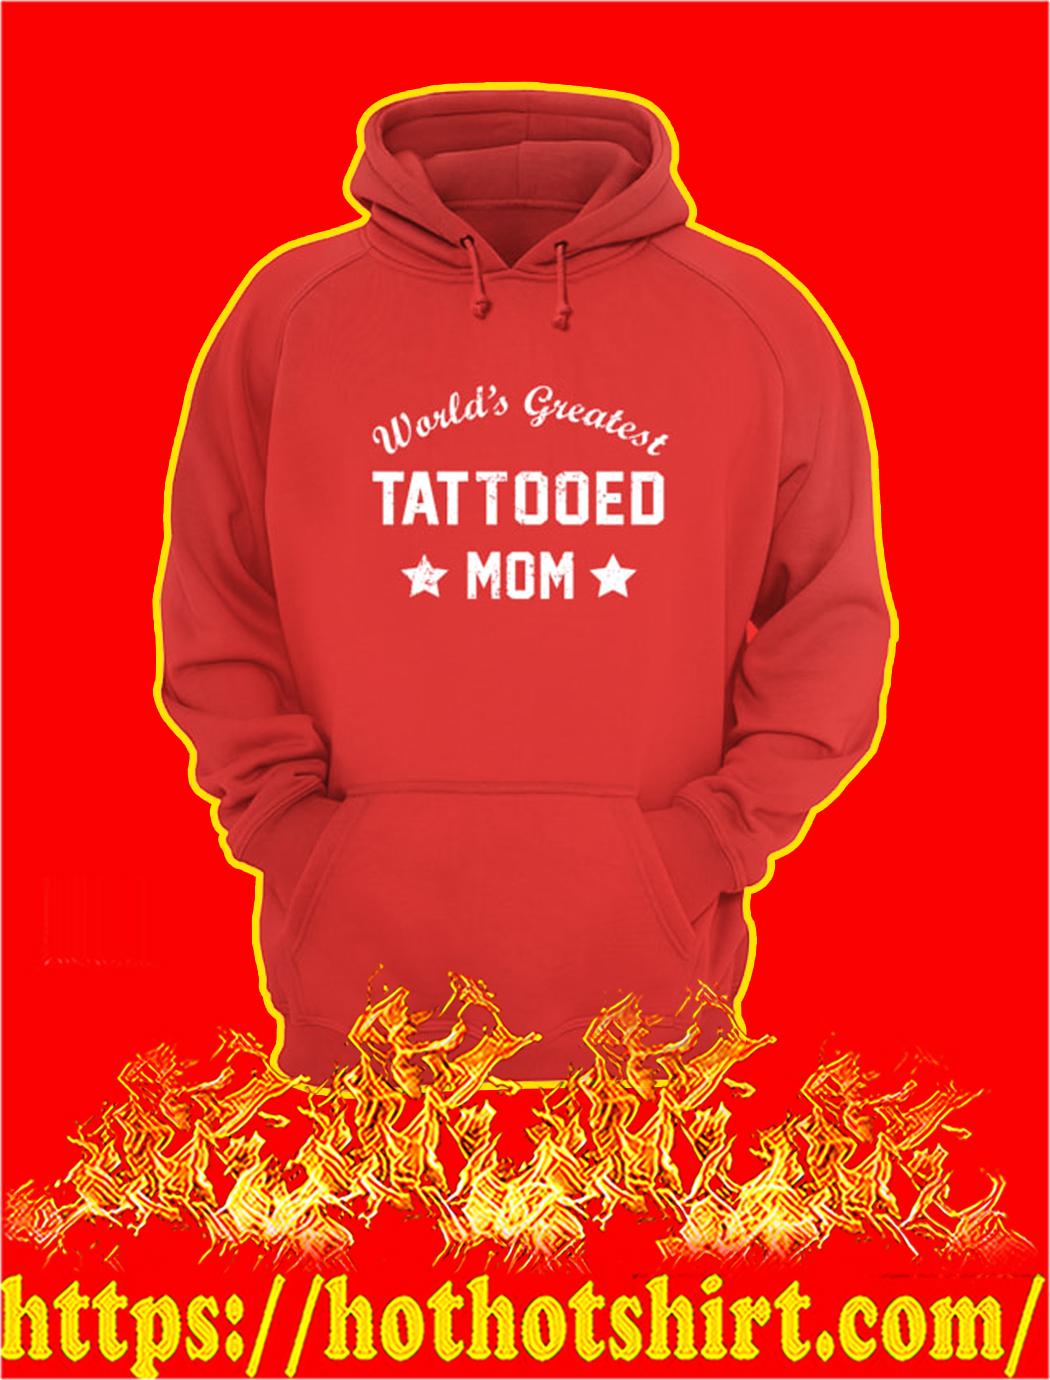 World's Greatest Tattooed Mom hoodie